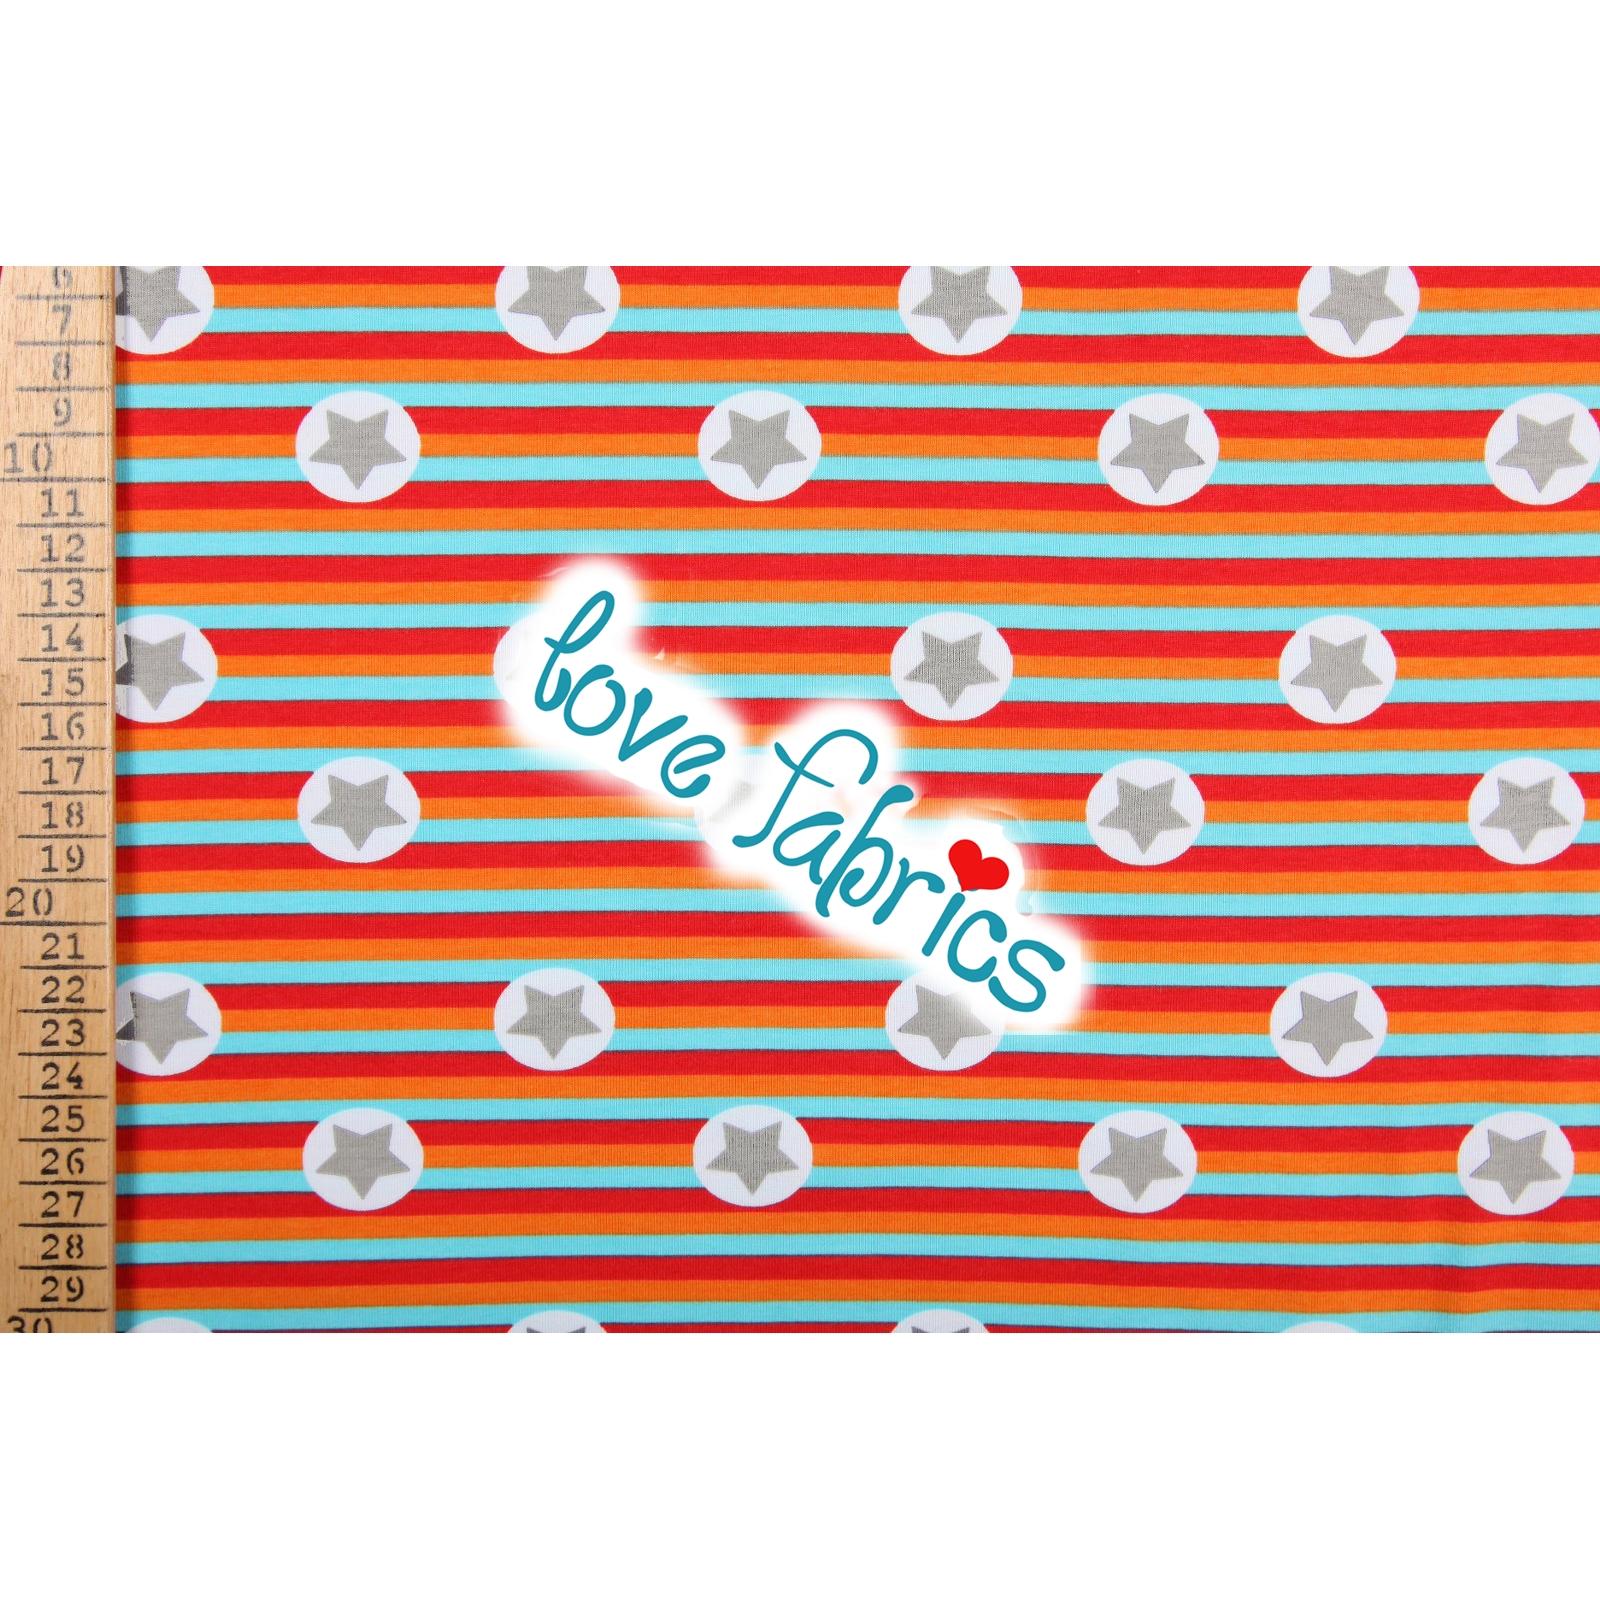 Stars on stripes orange